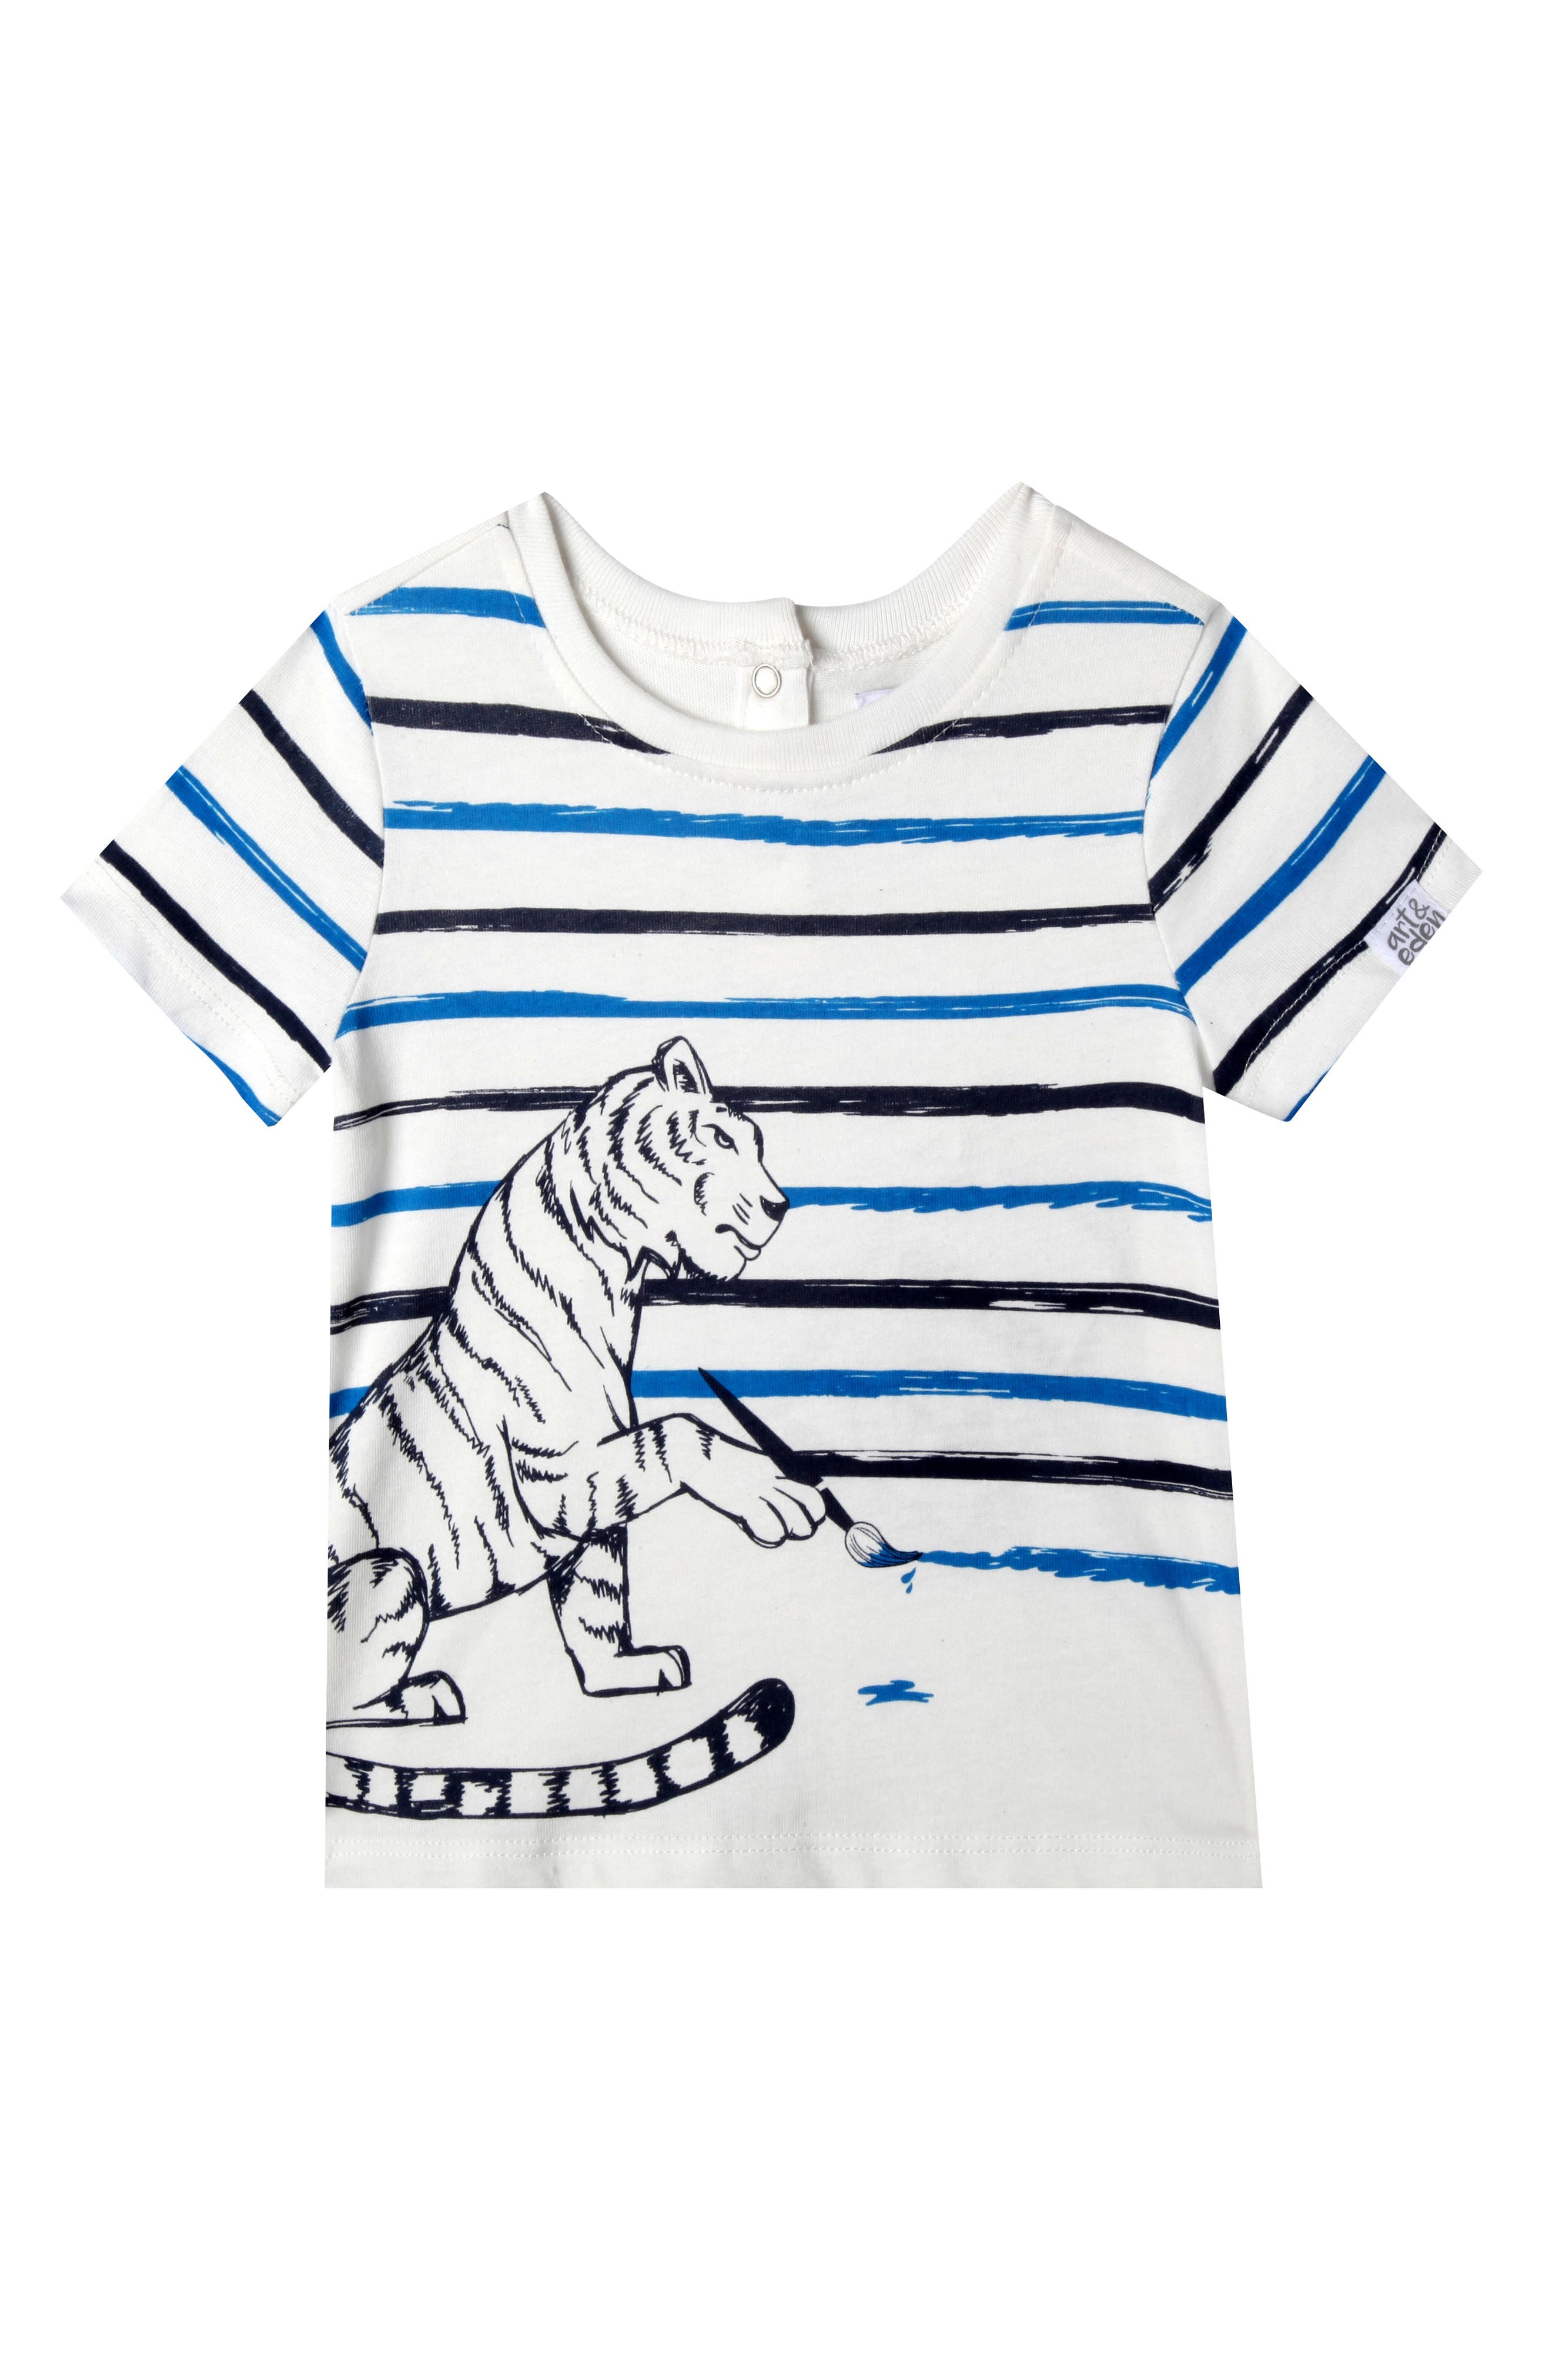 Caleb T-Shirt,                             Main thumbnail 1, color,                             EGRET